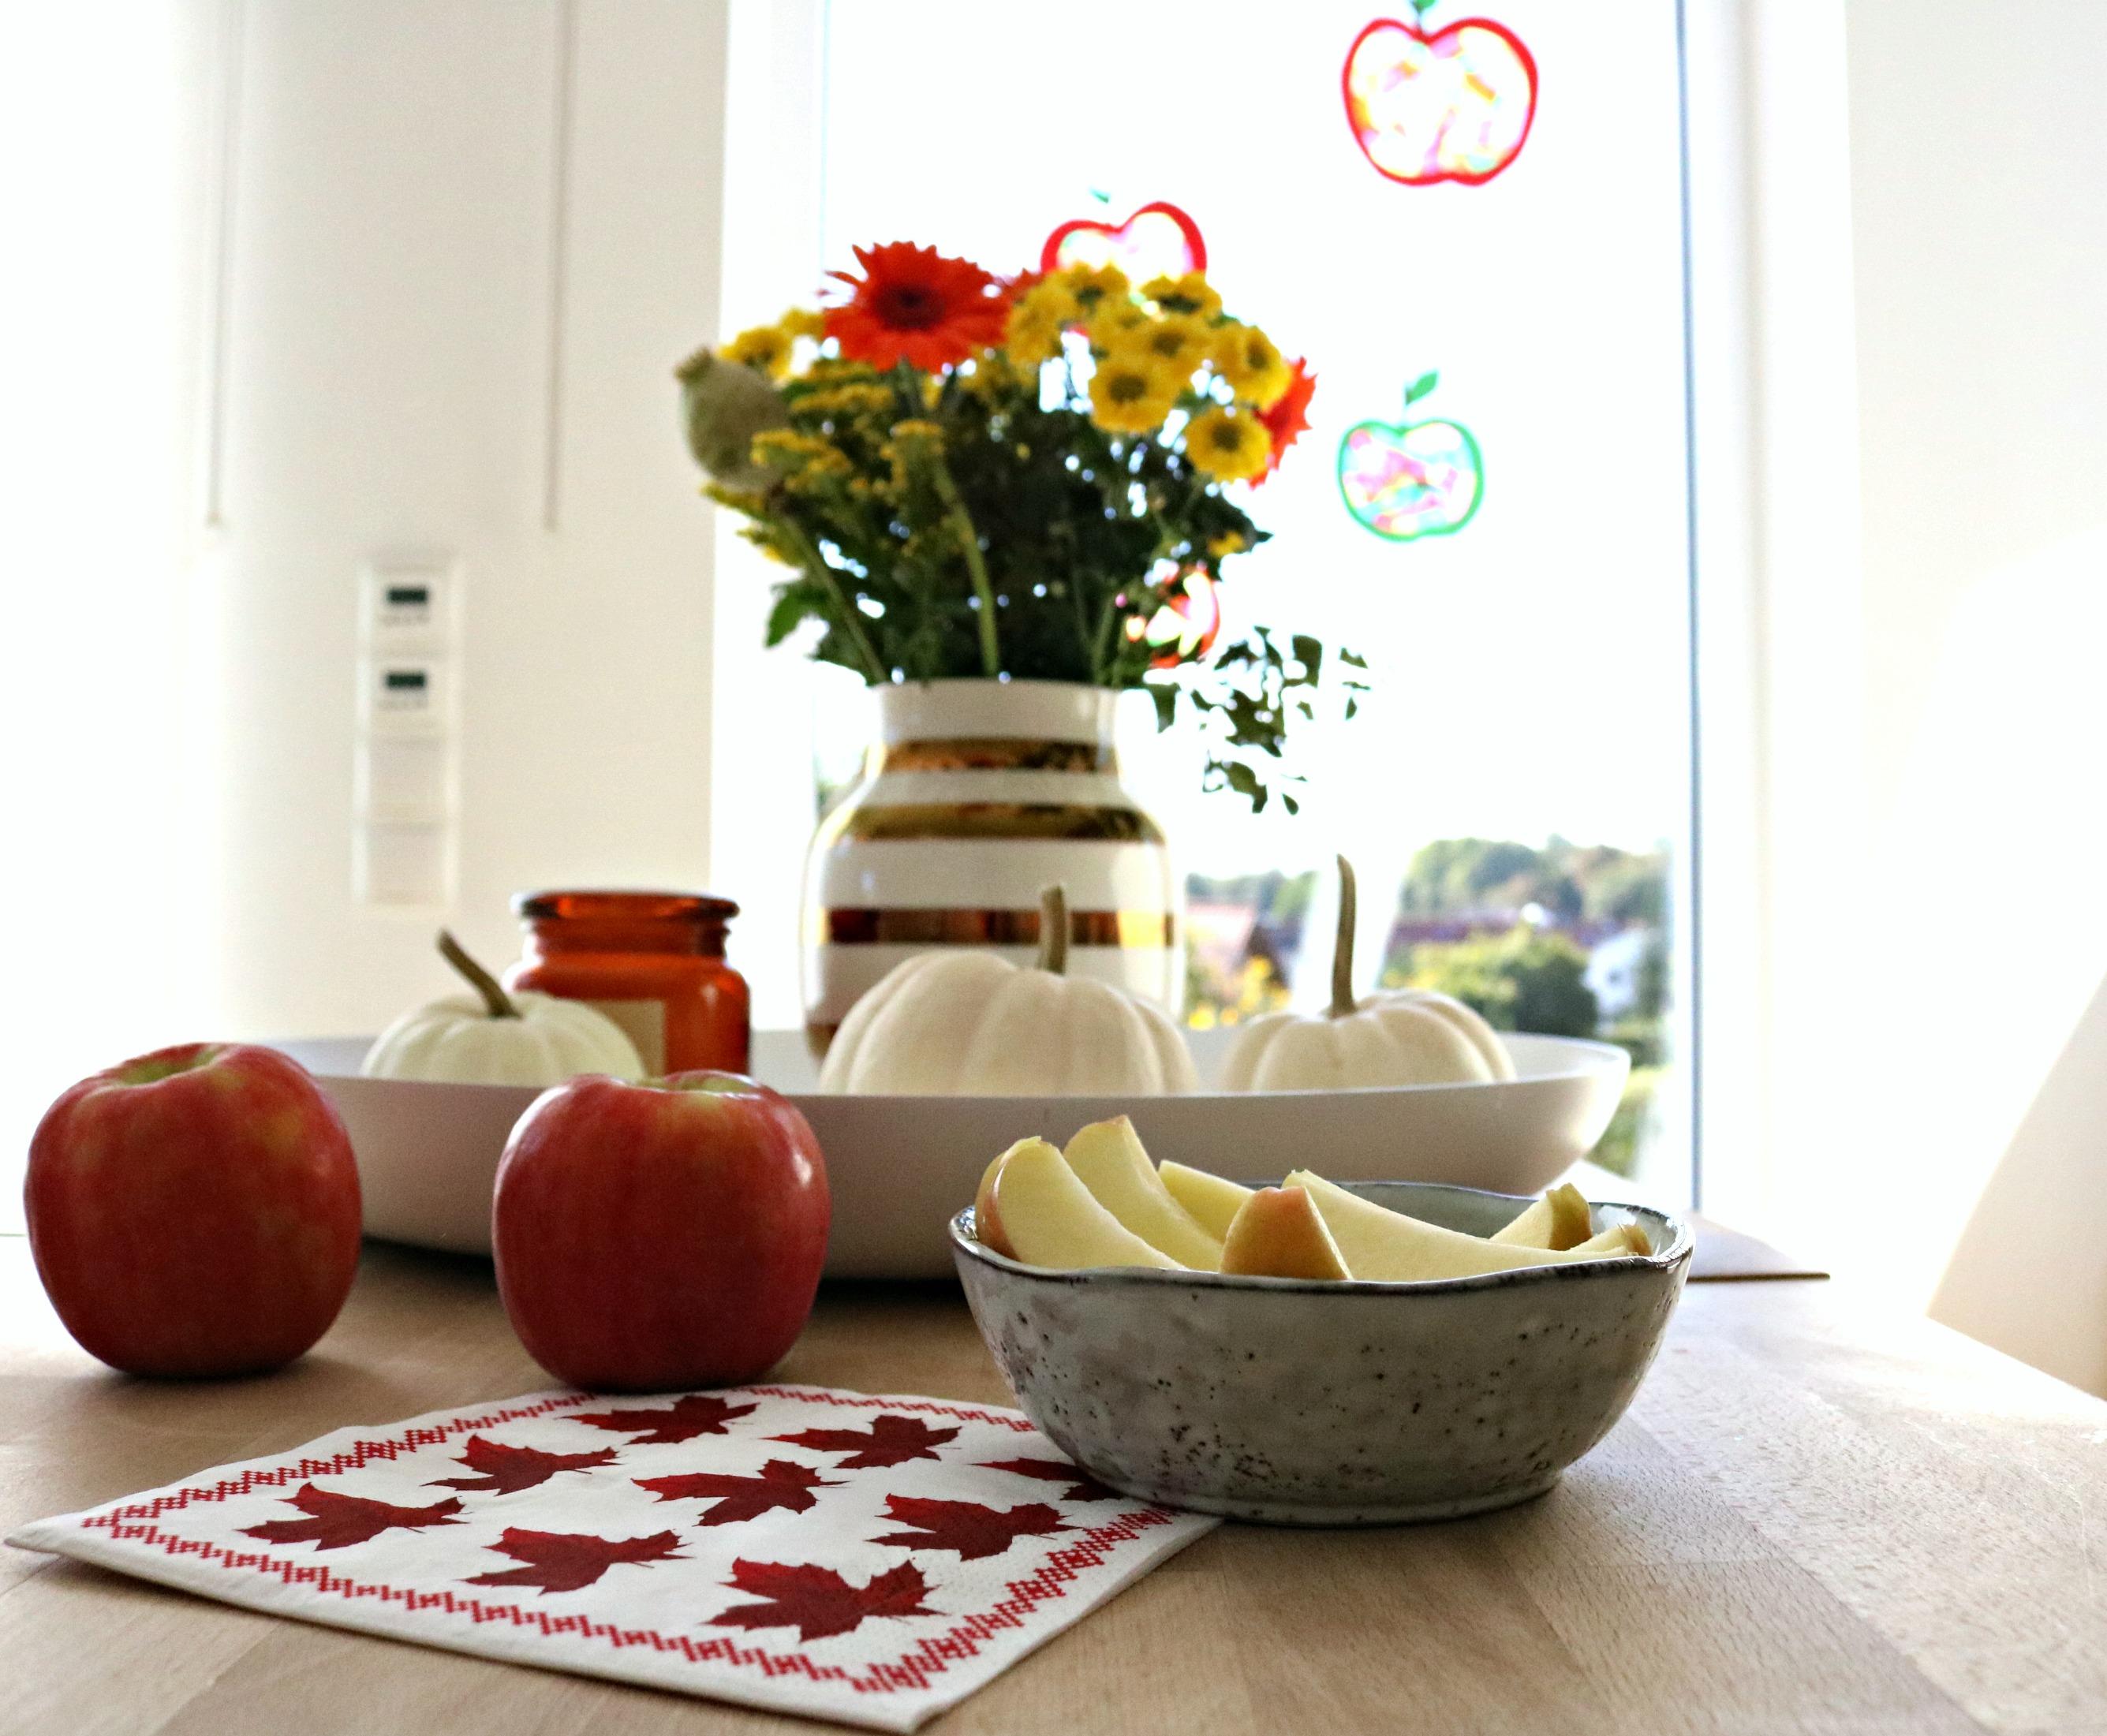 Apfelfensterbild_Herbstdeko